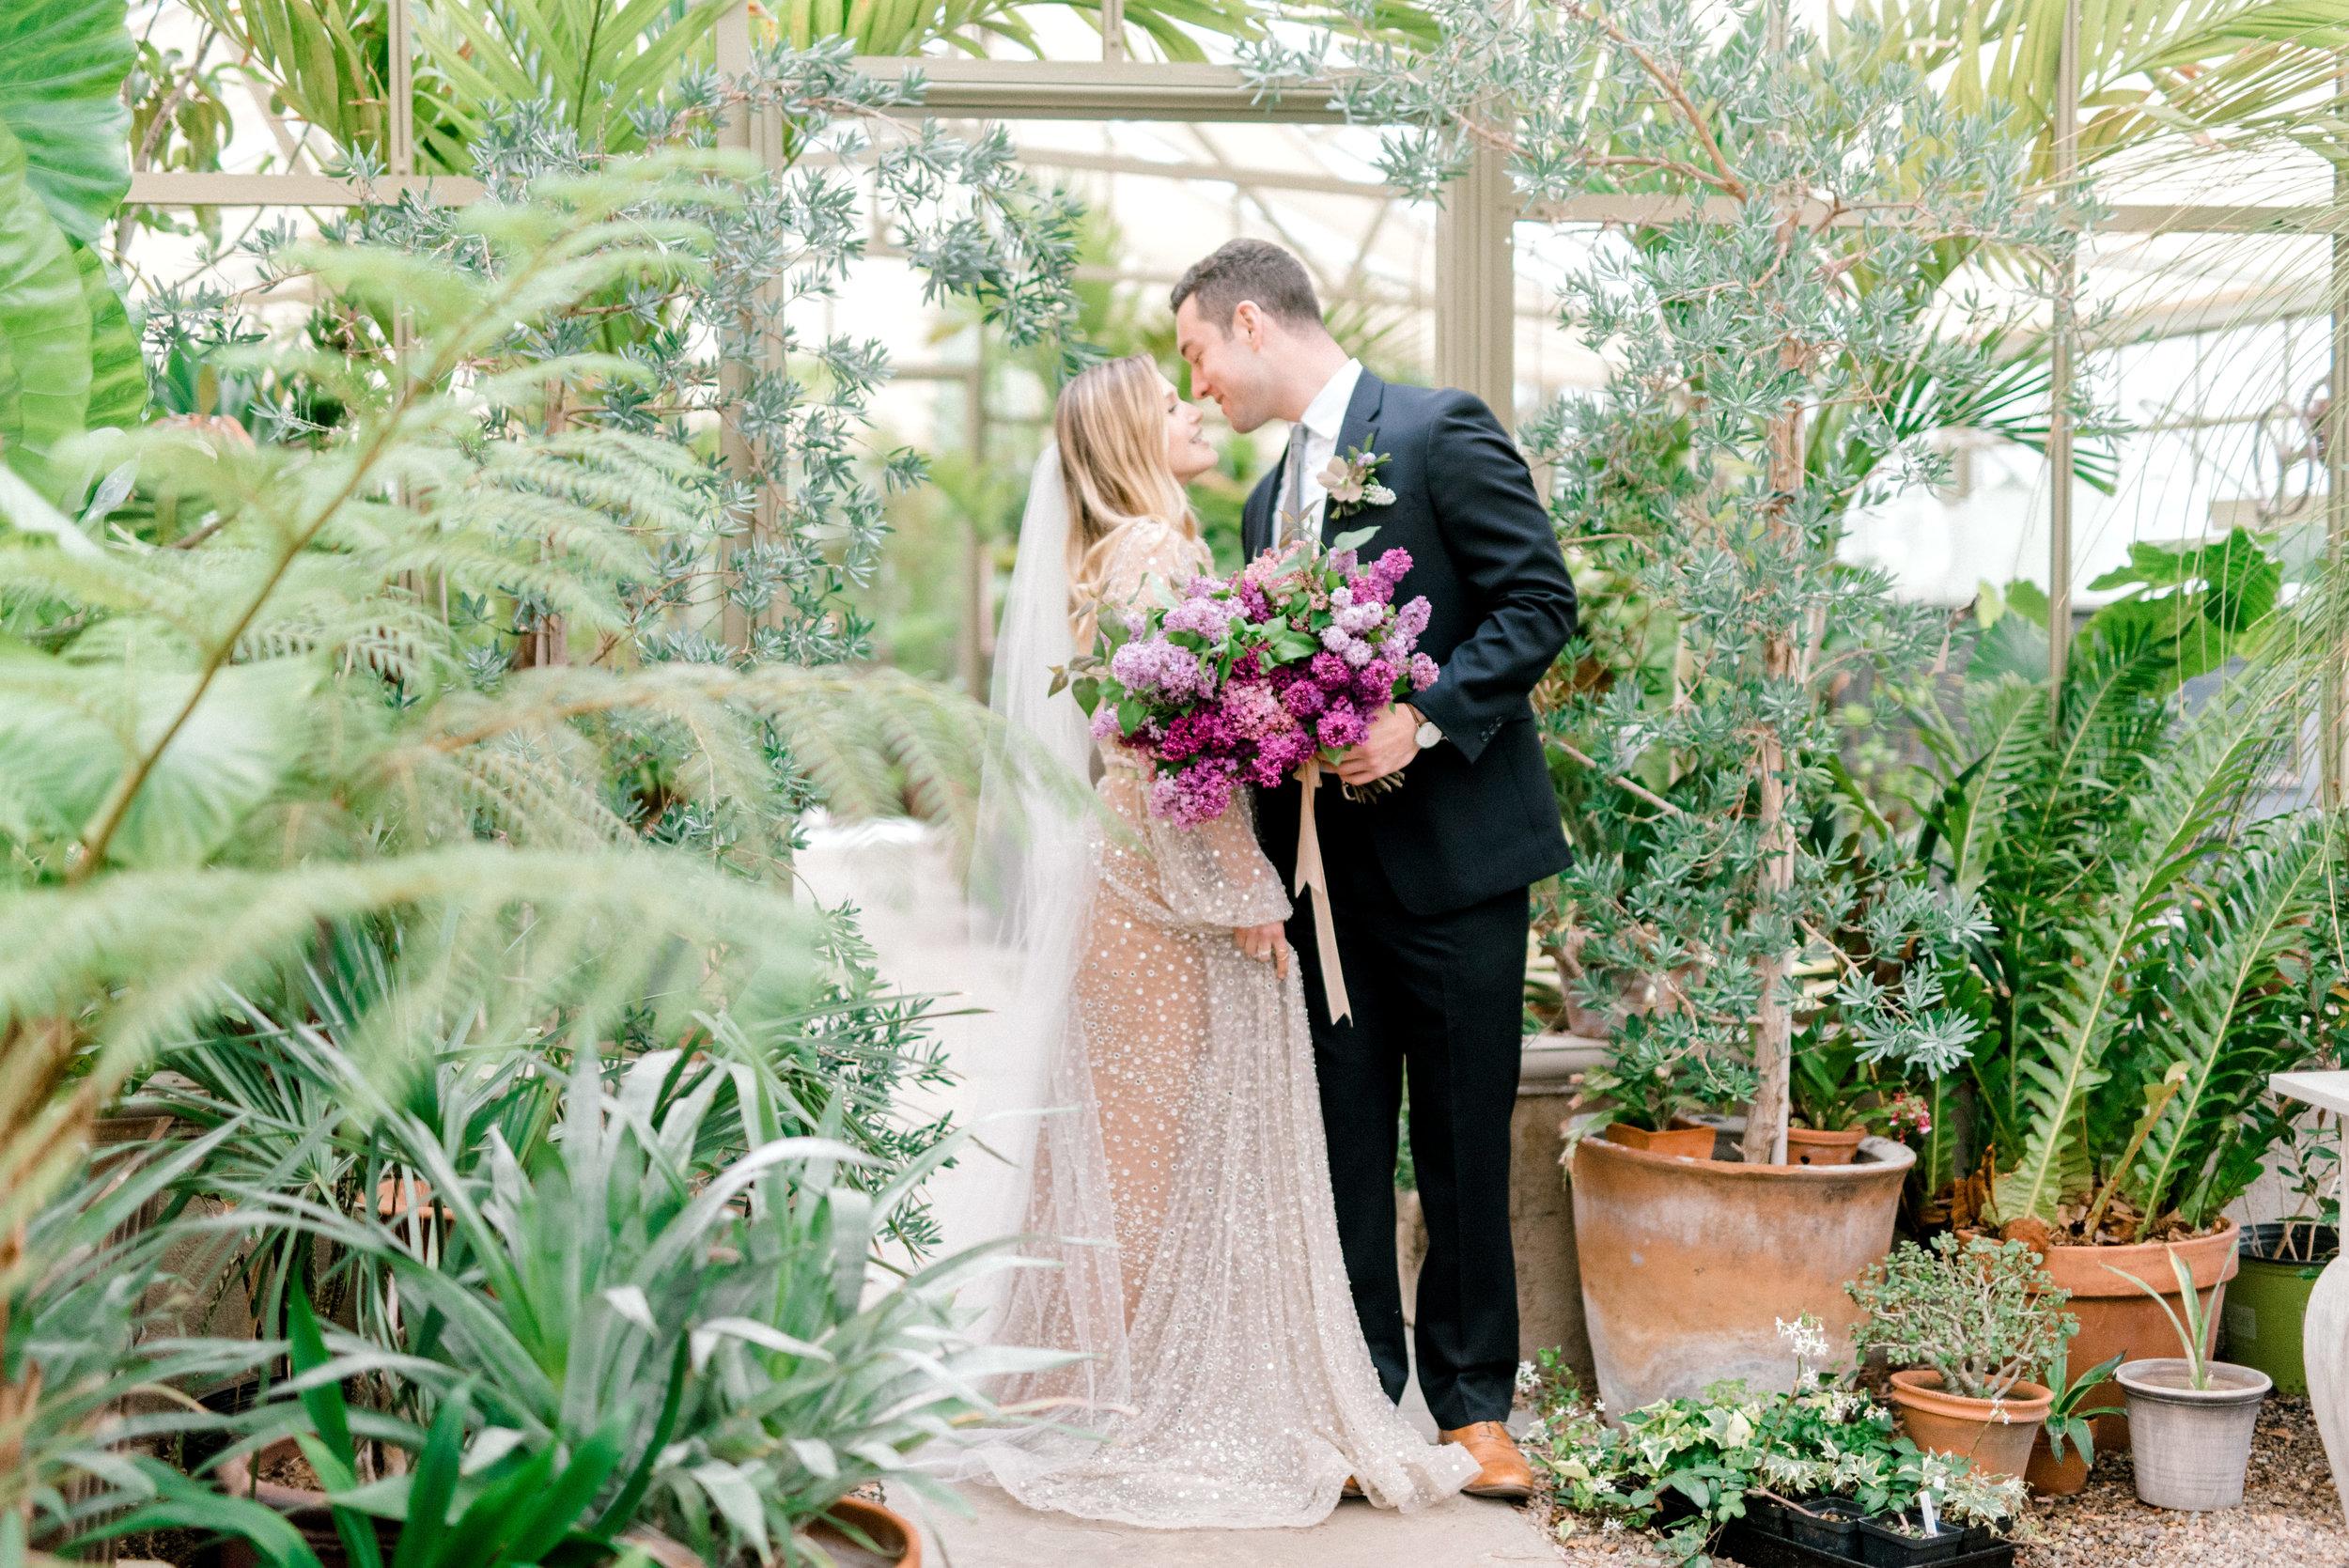 haley-richter-photography-jardin-de-buis-wedding-photos-lilac-bouquet-036.jpg